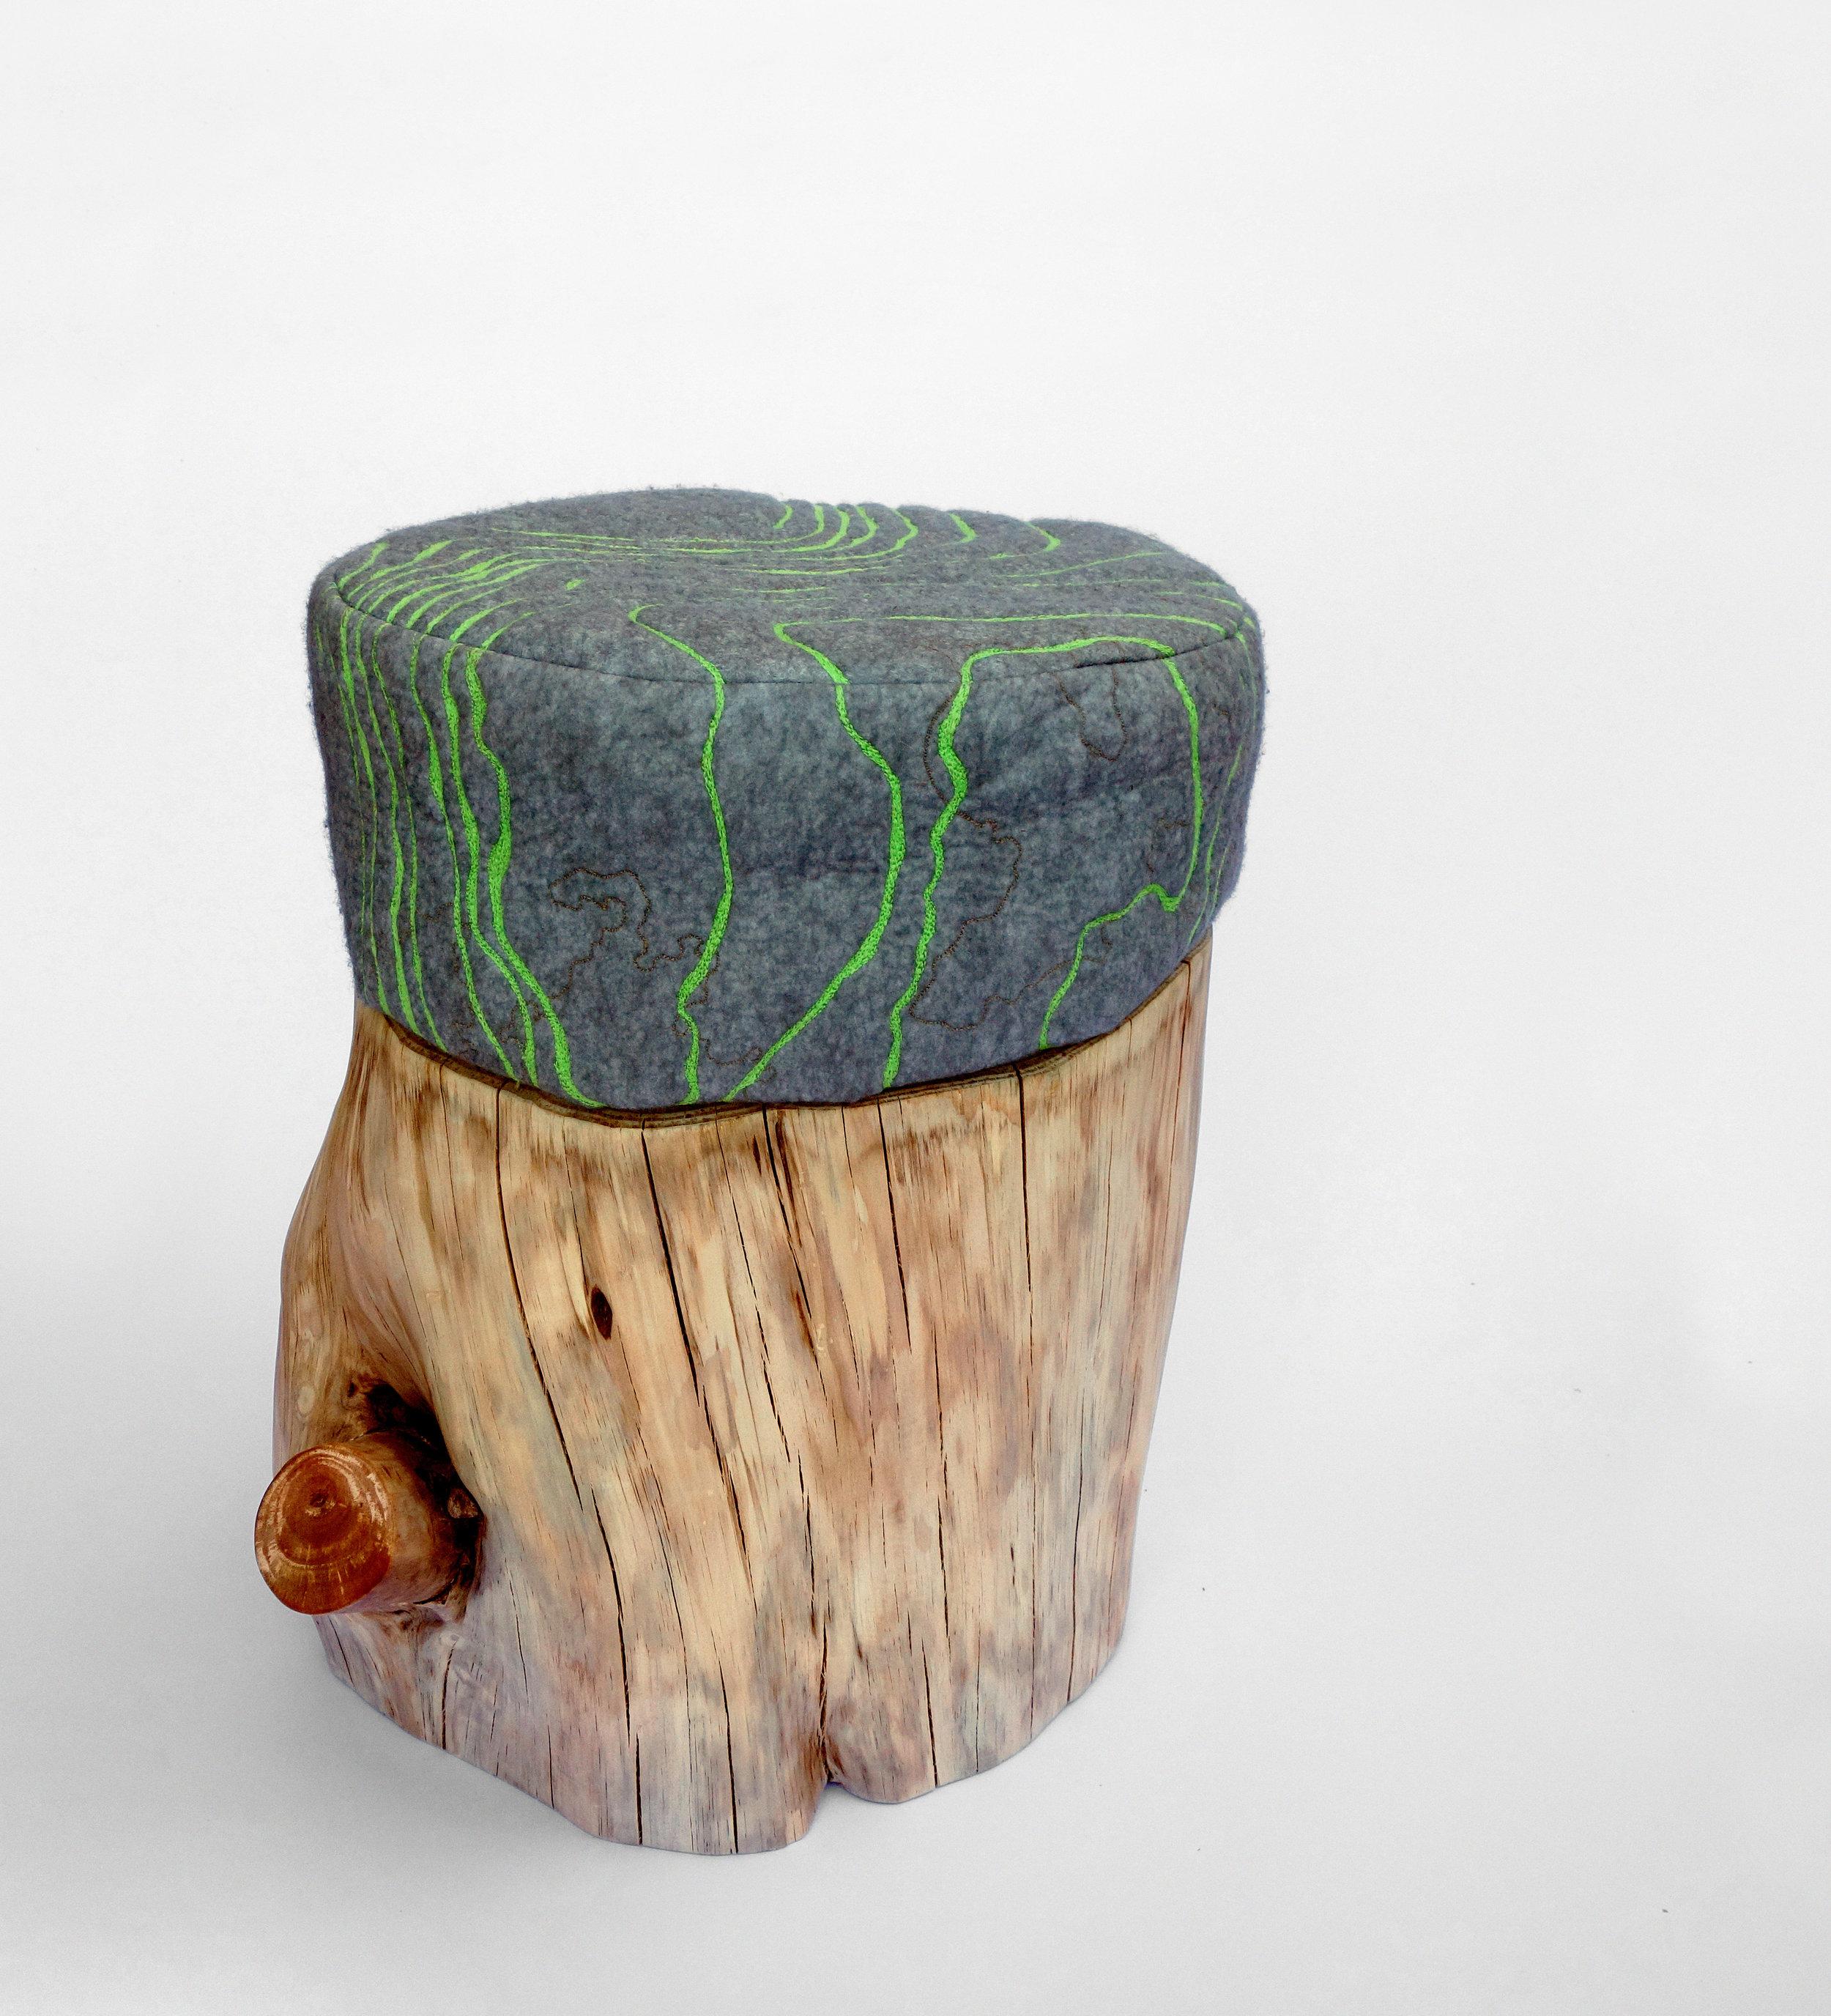 esker-stool-1-nicholas-baker